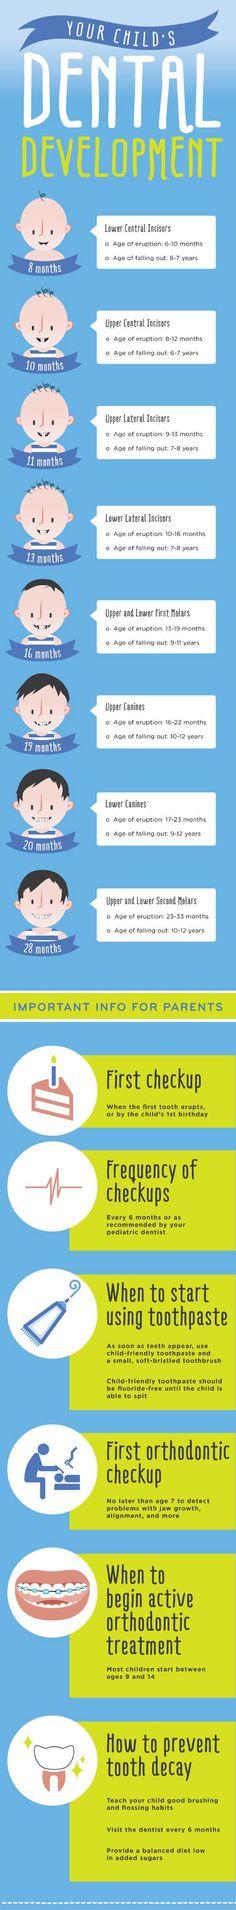 Your child's dental development.